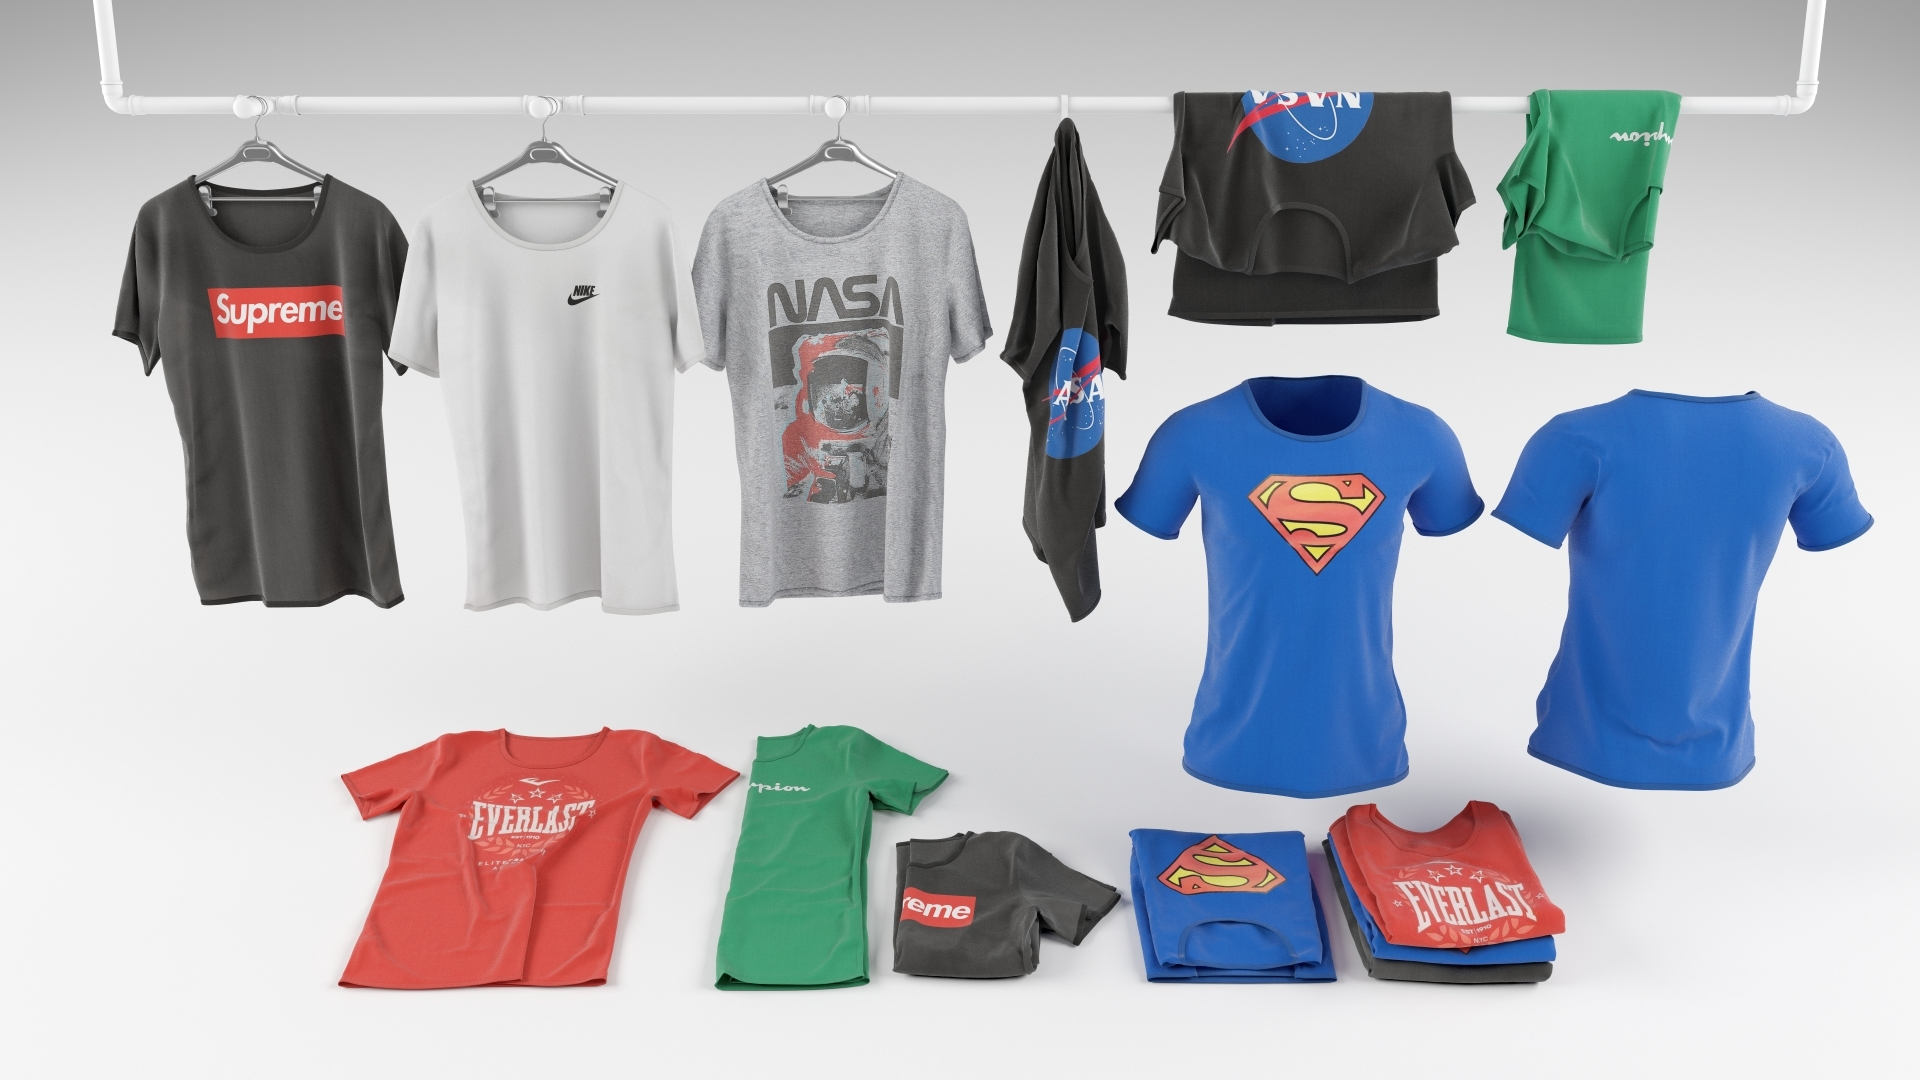 nike shirt 3d model